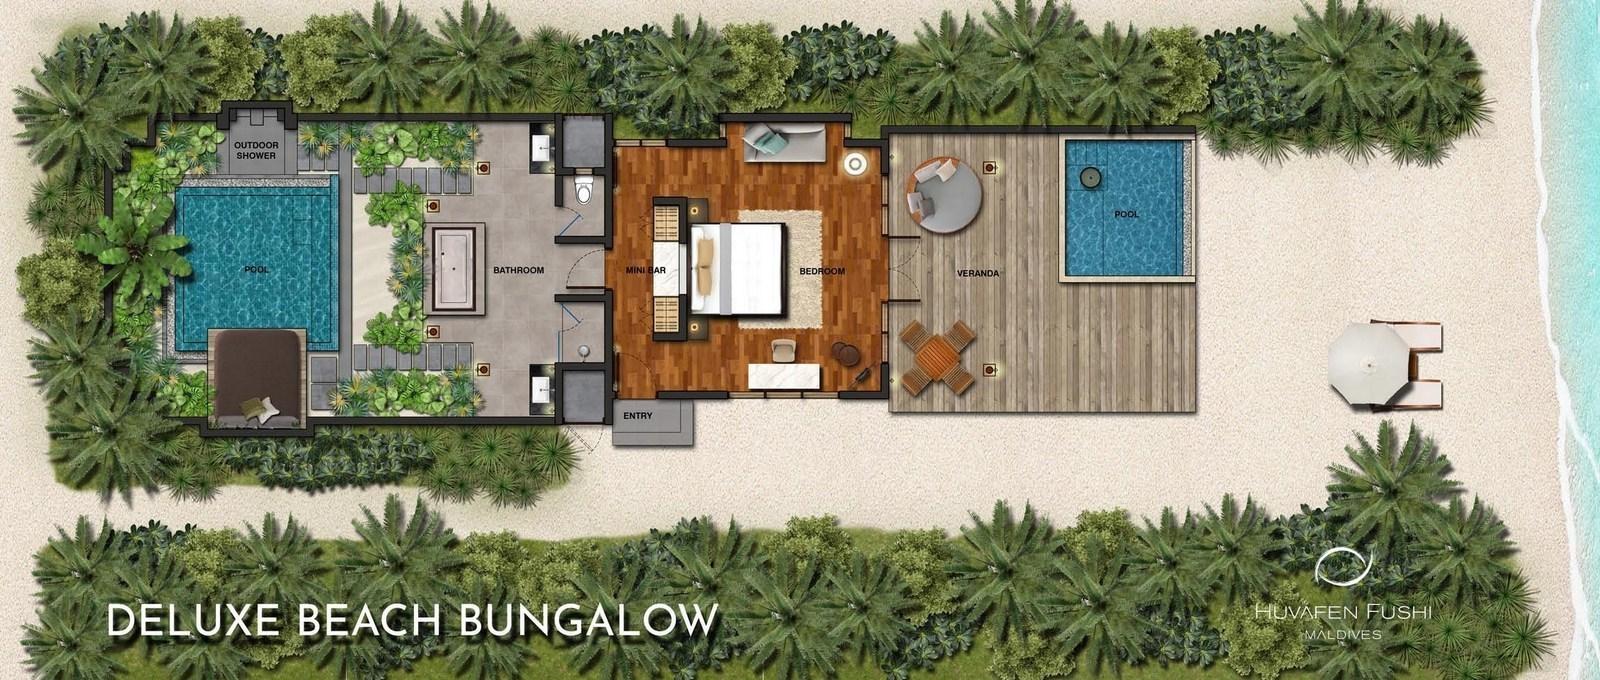 Мальдивы, отель Huvafen Fushi Maldives, план-схема номера Deluxe Beach Bungalow with Pool